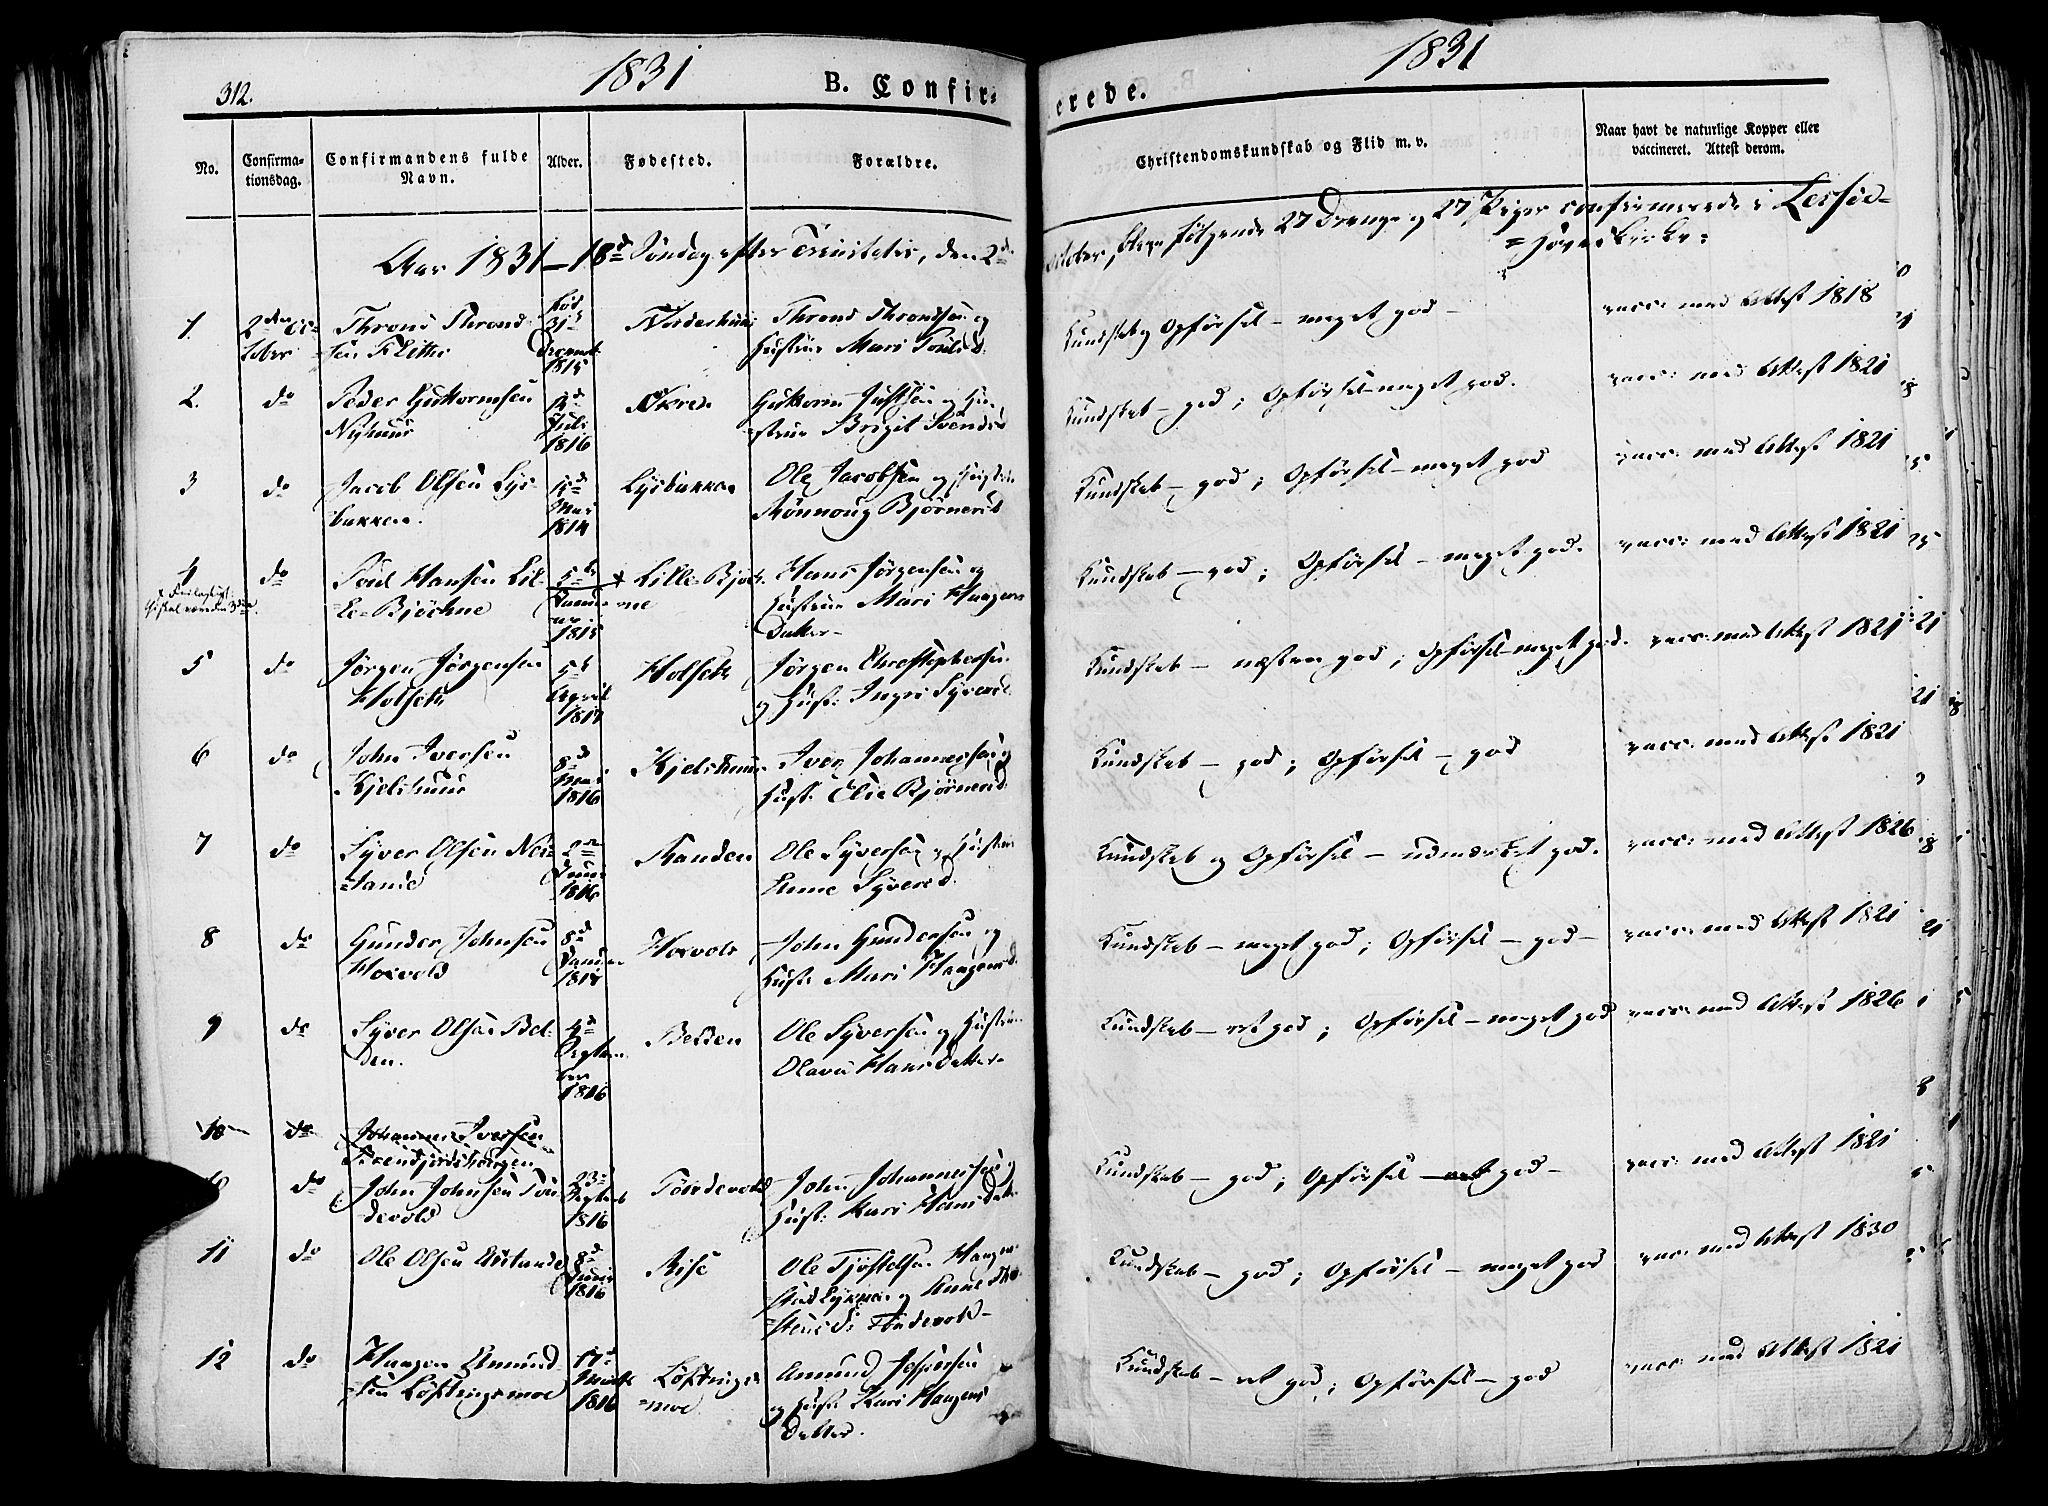 SAH, Lesja prestekontor, Ministerialbok nr. 5, 1830-1842, s. 312